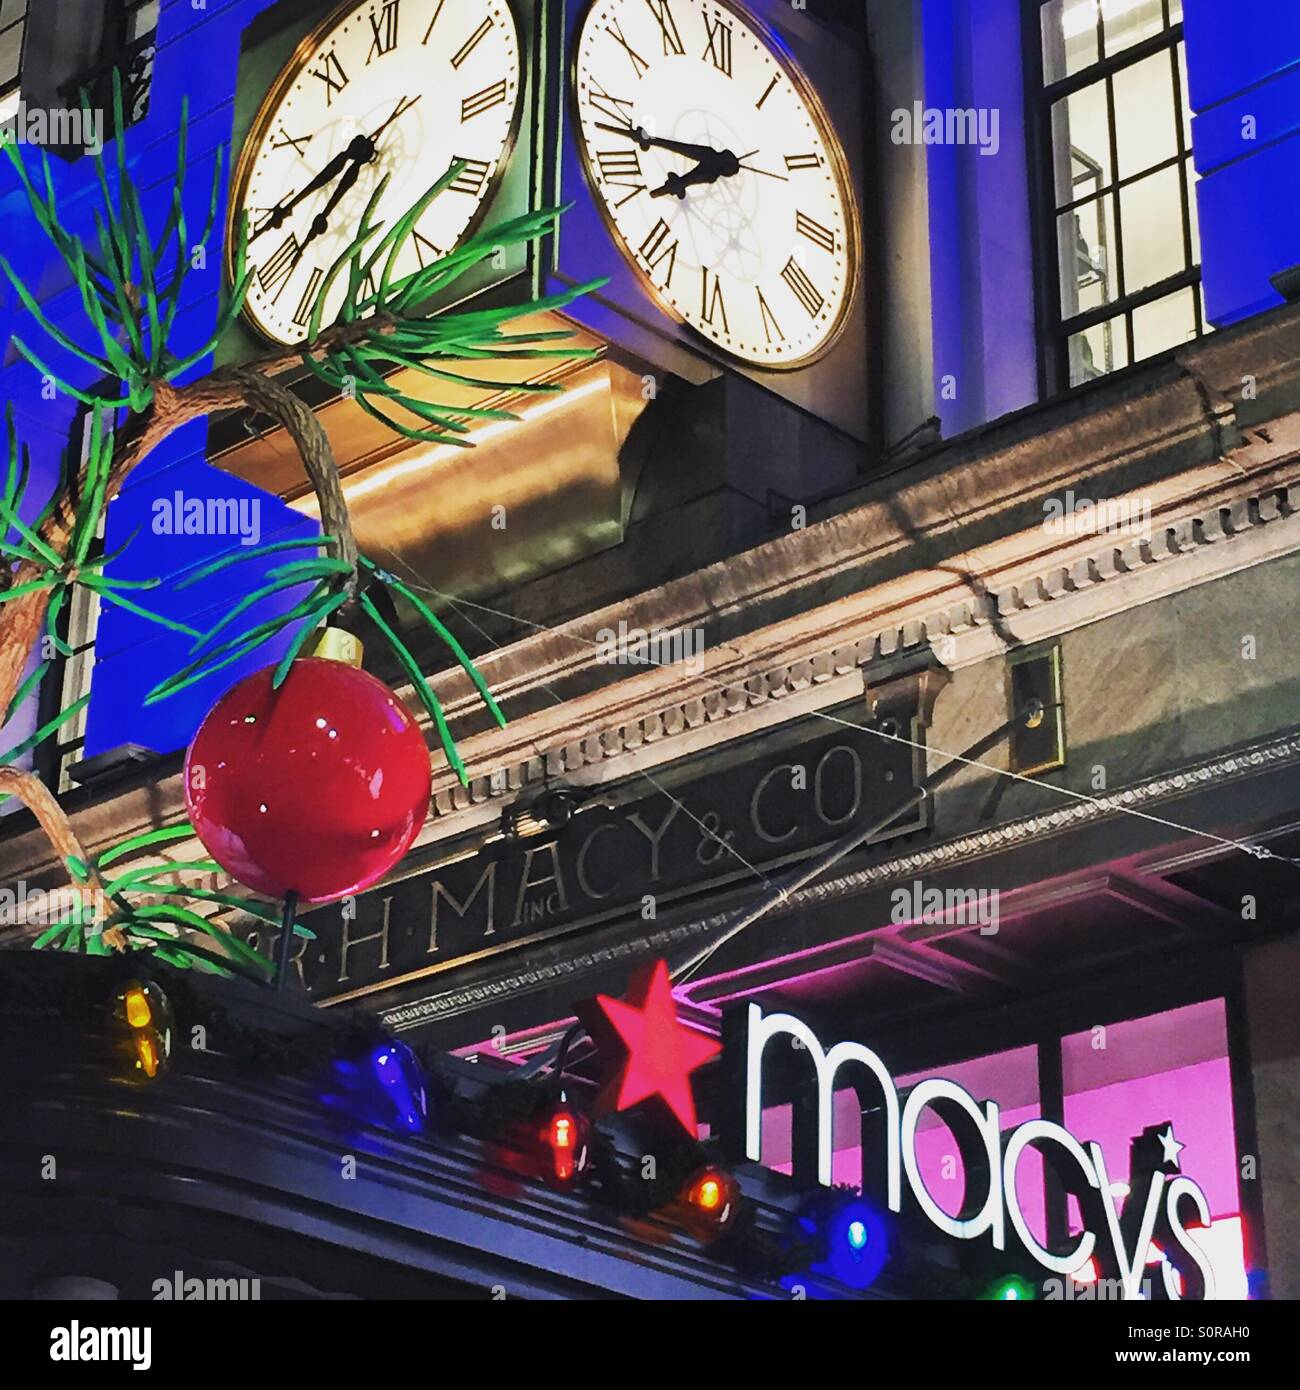 Macys New York Stock Photos & Macys New York Stock Images